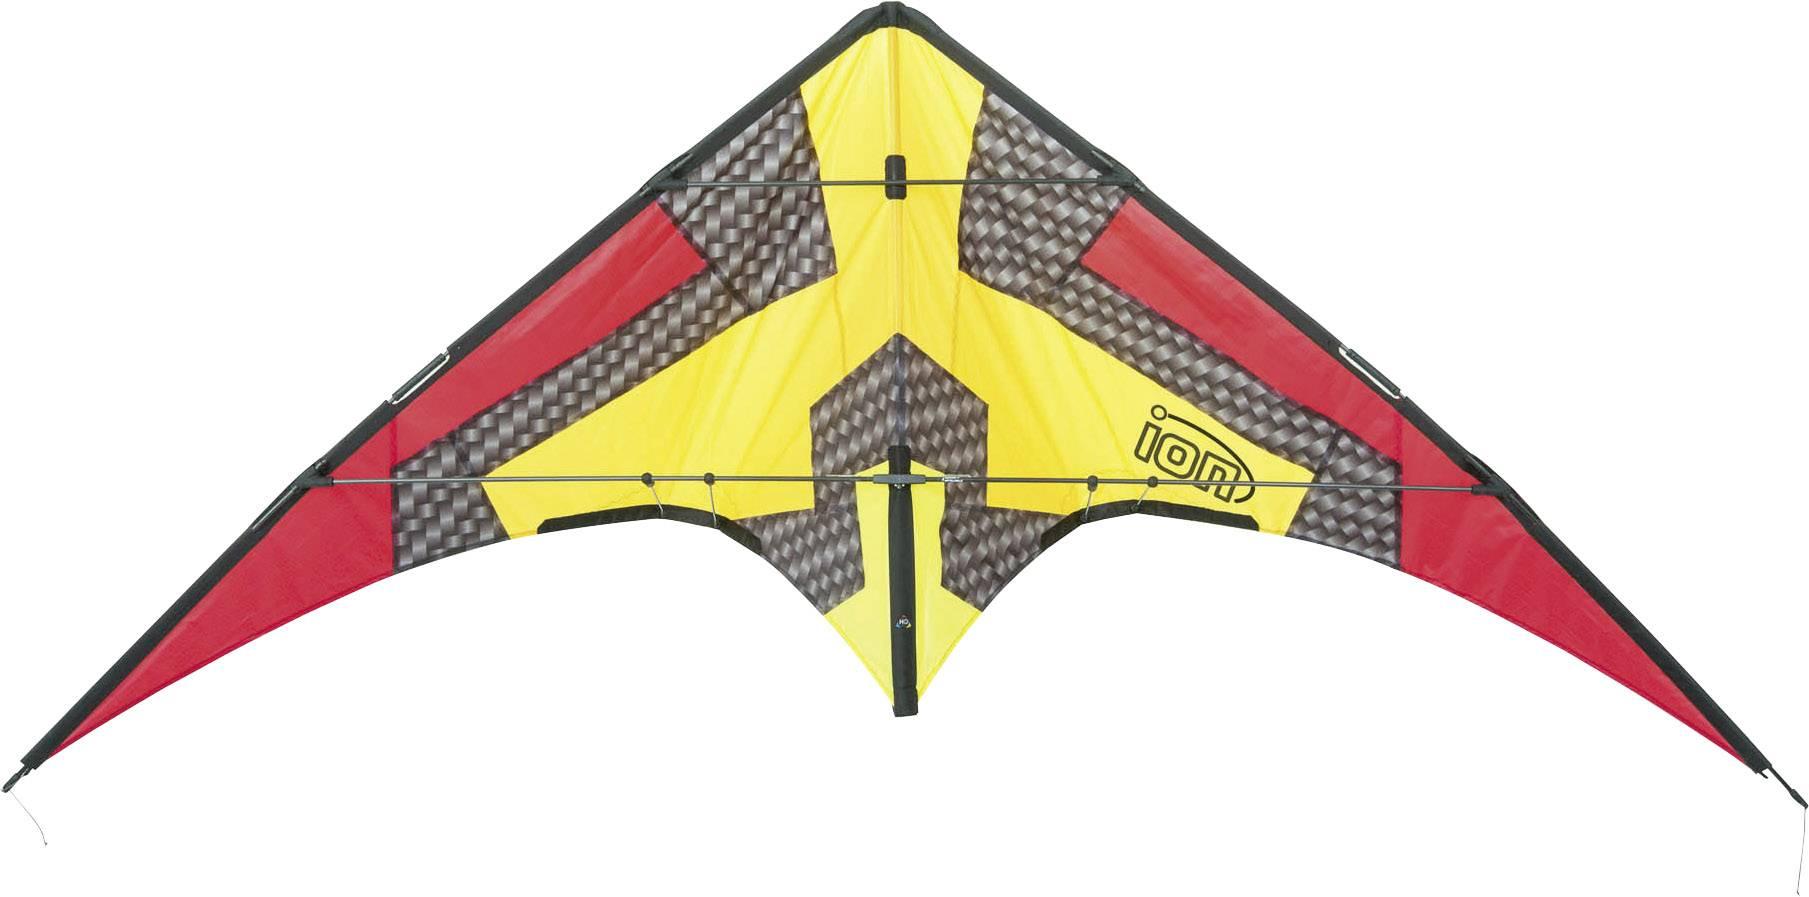 Športový šarkan HQ Ion Blaze 11660117, rozpätie 2050 mm